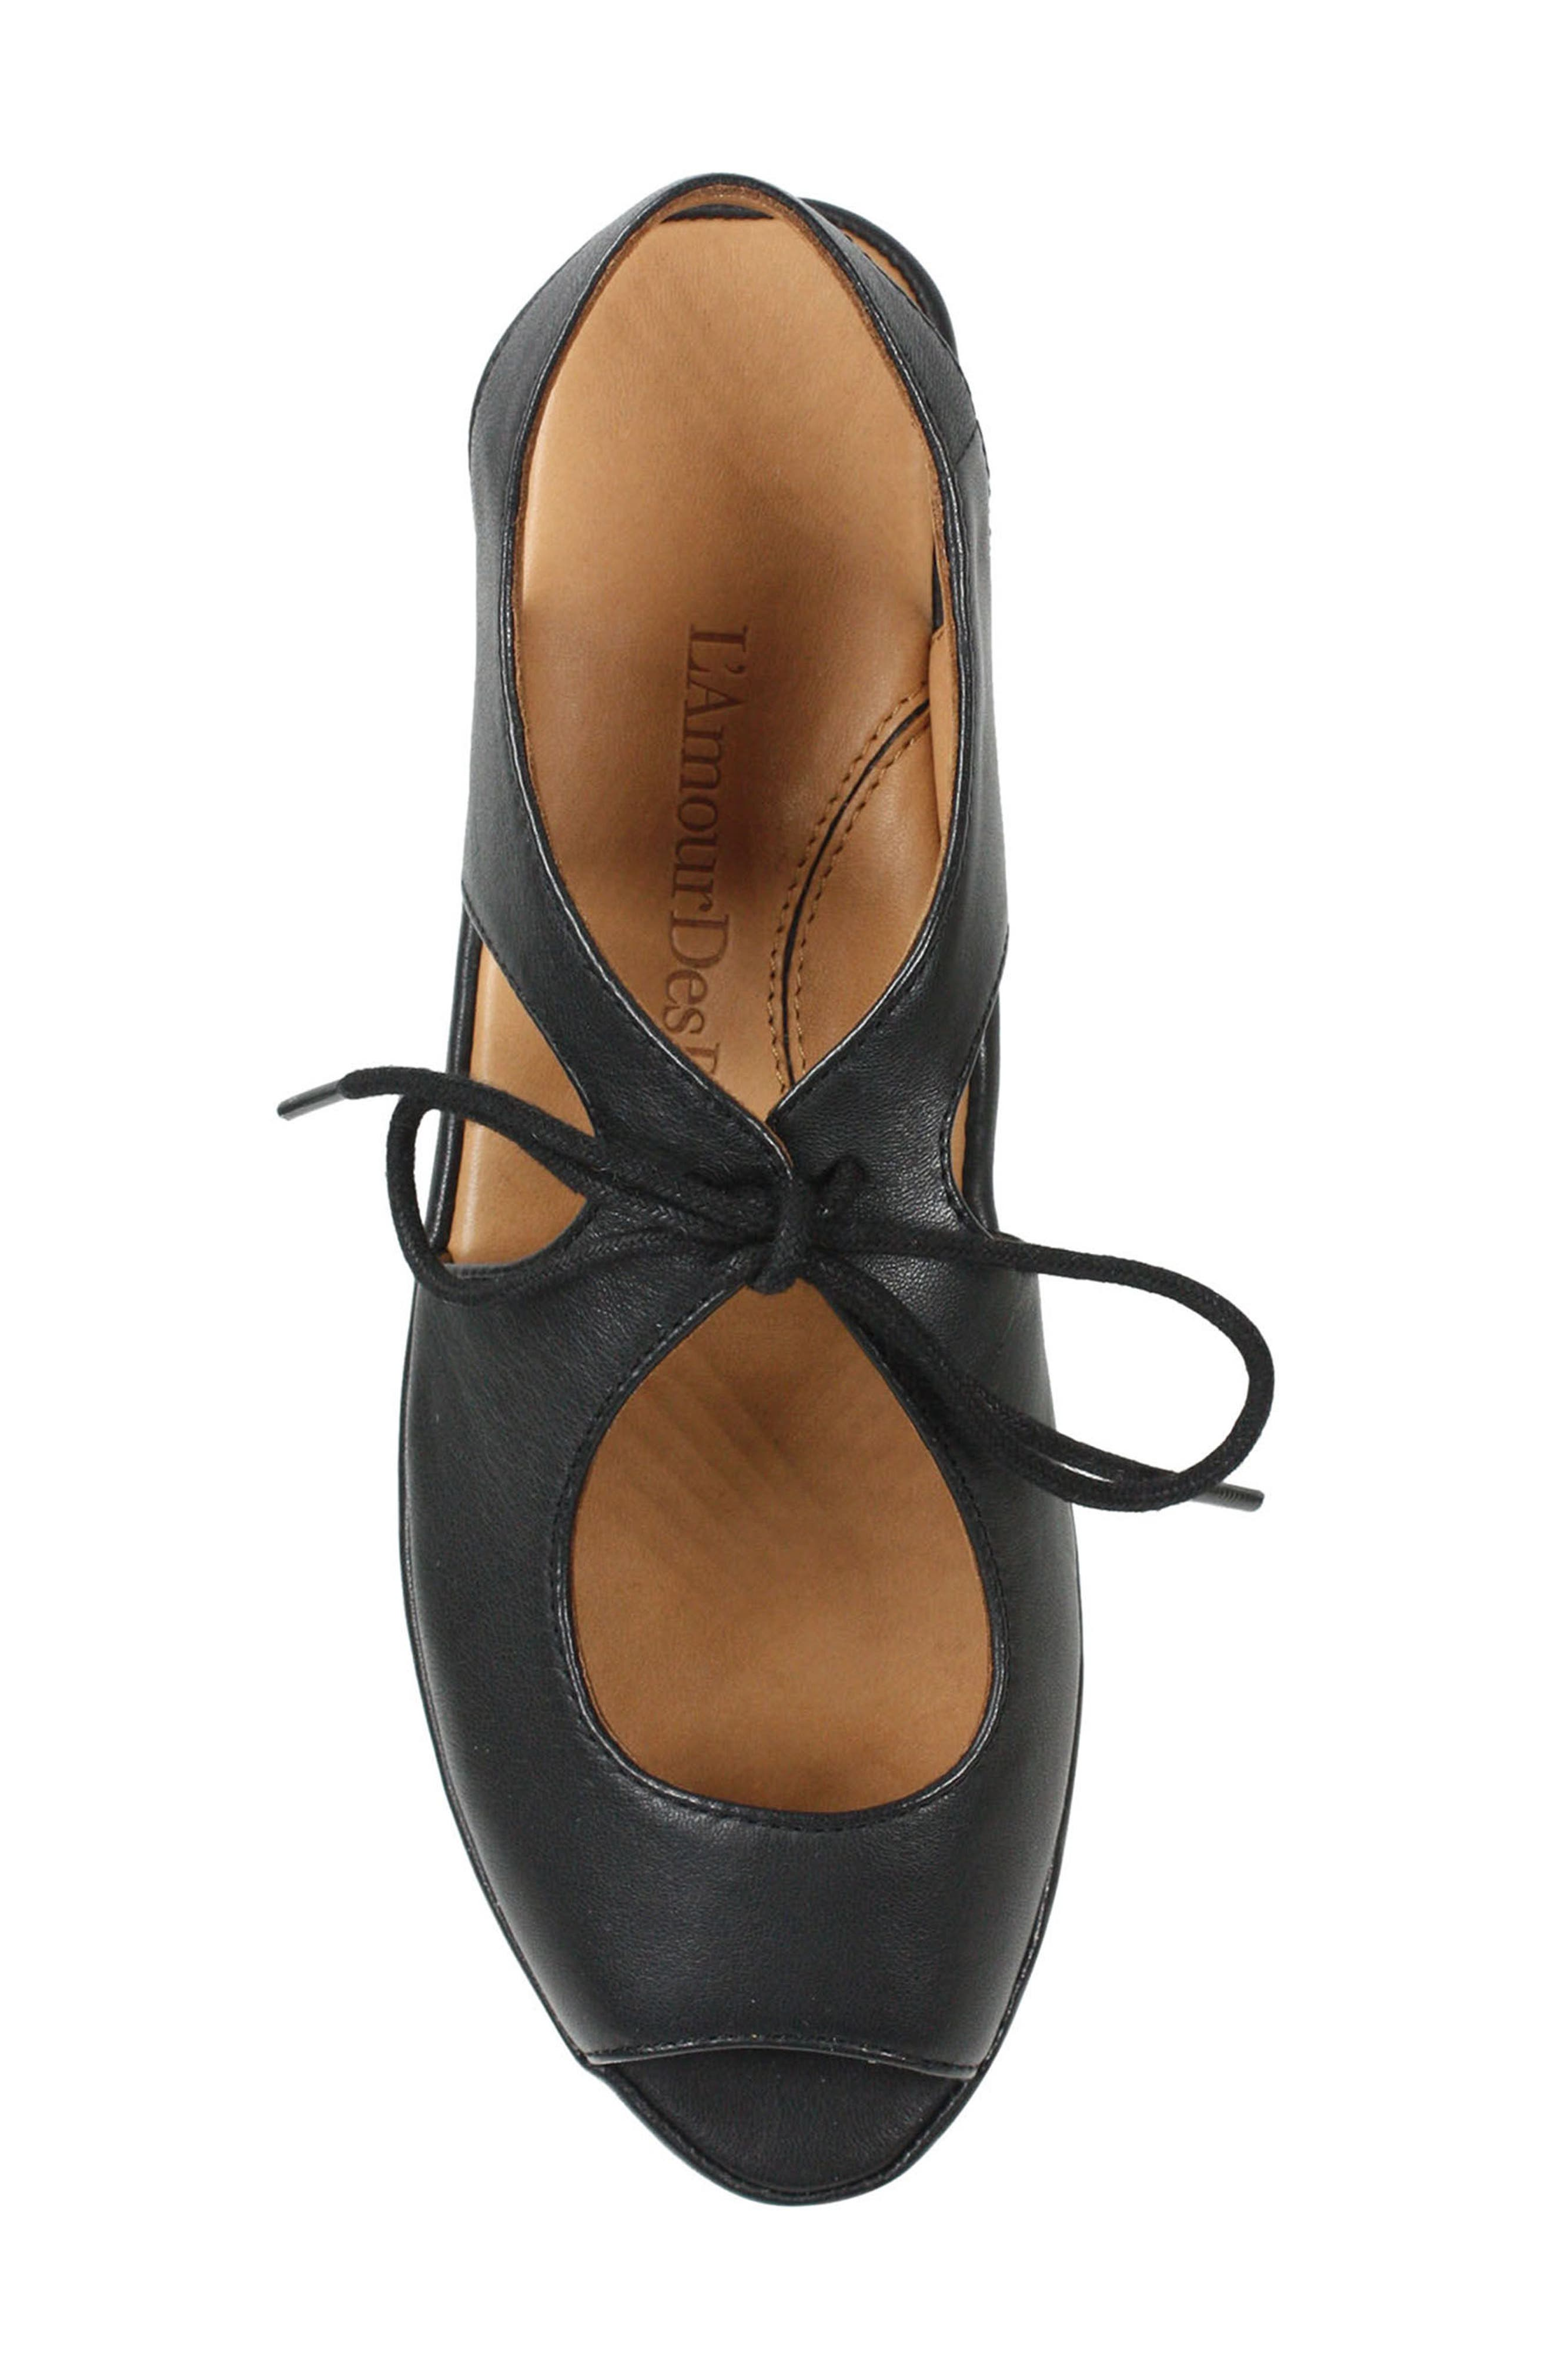 Brettany Sandal,                             Alternate thumbnail 5, color,                             Black Leather